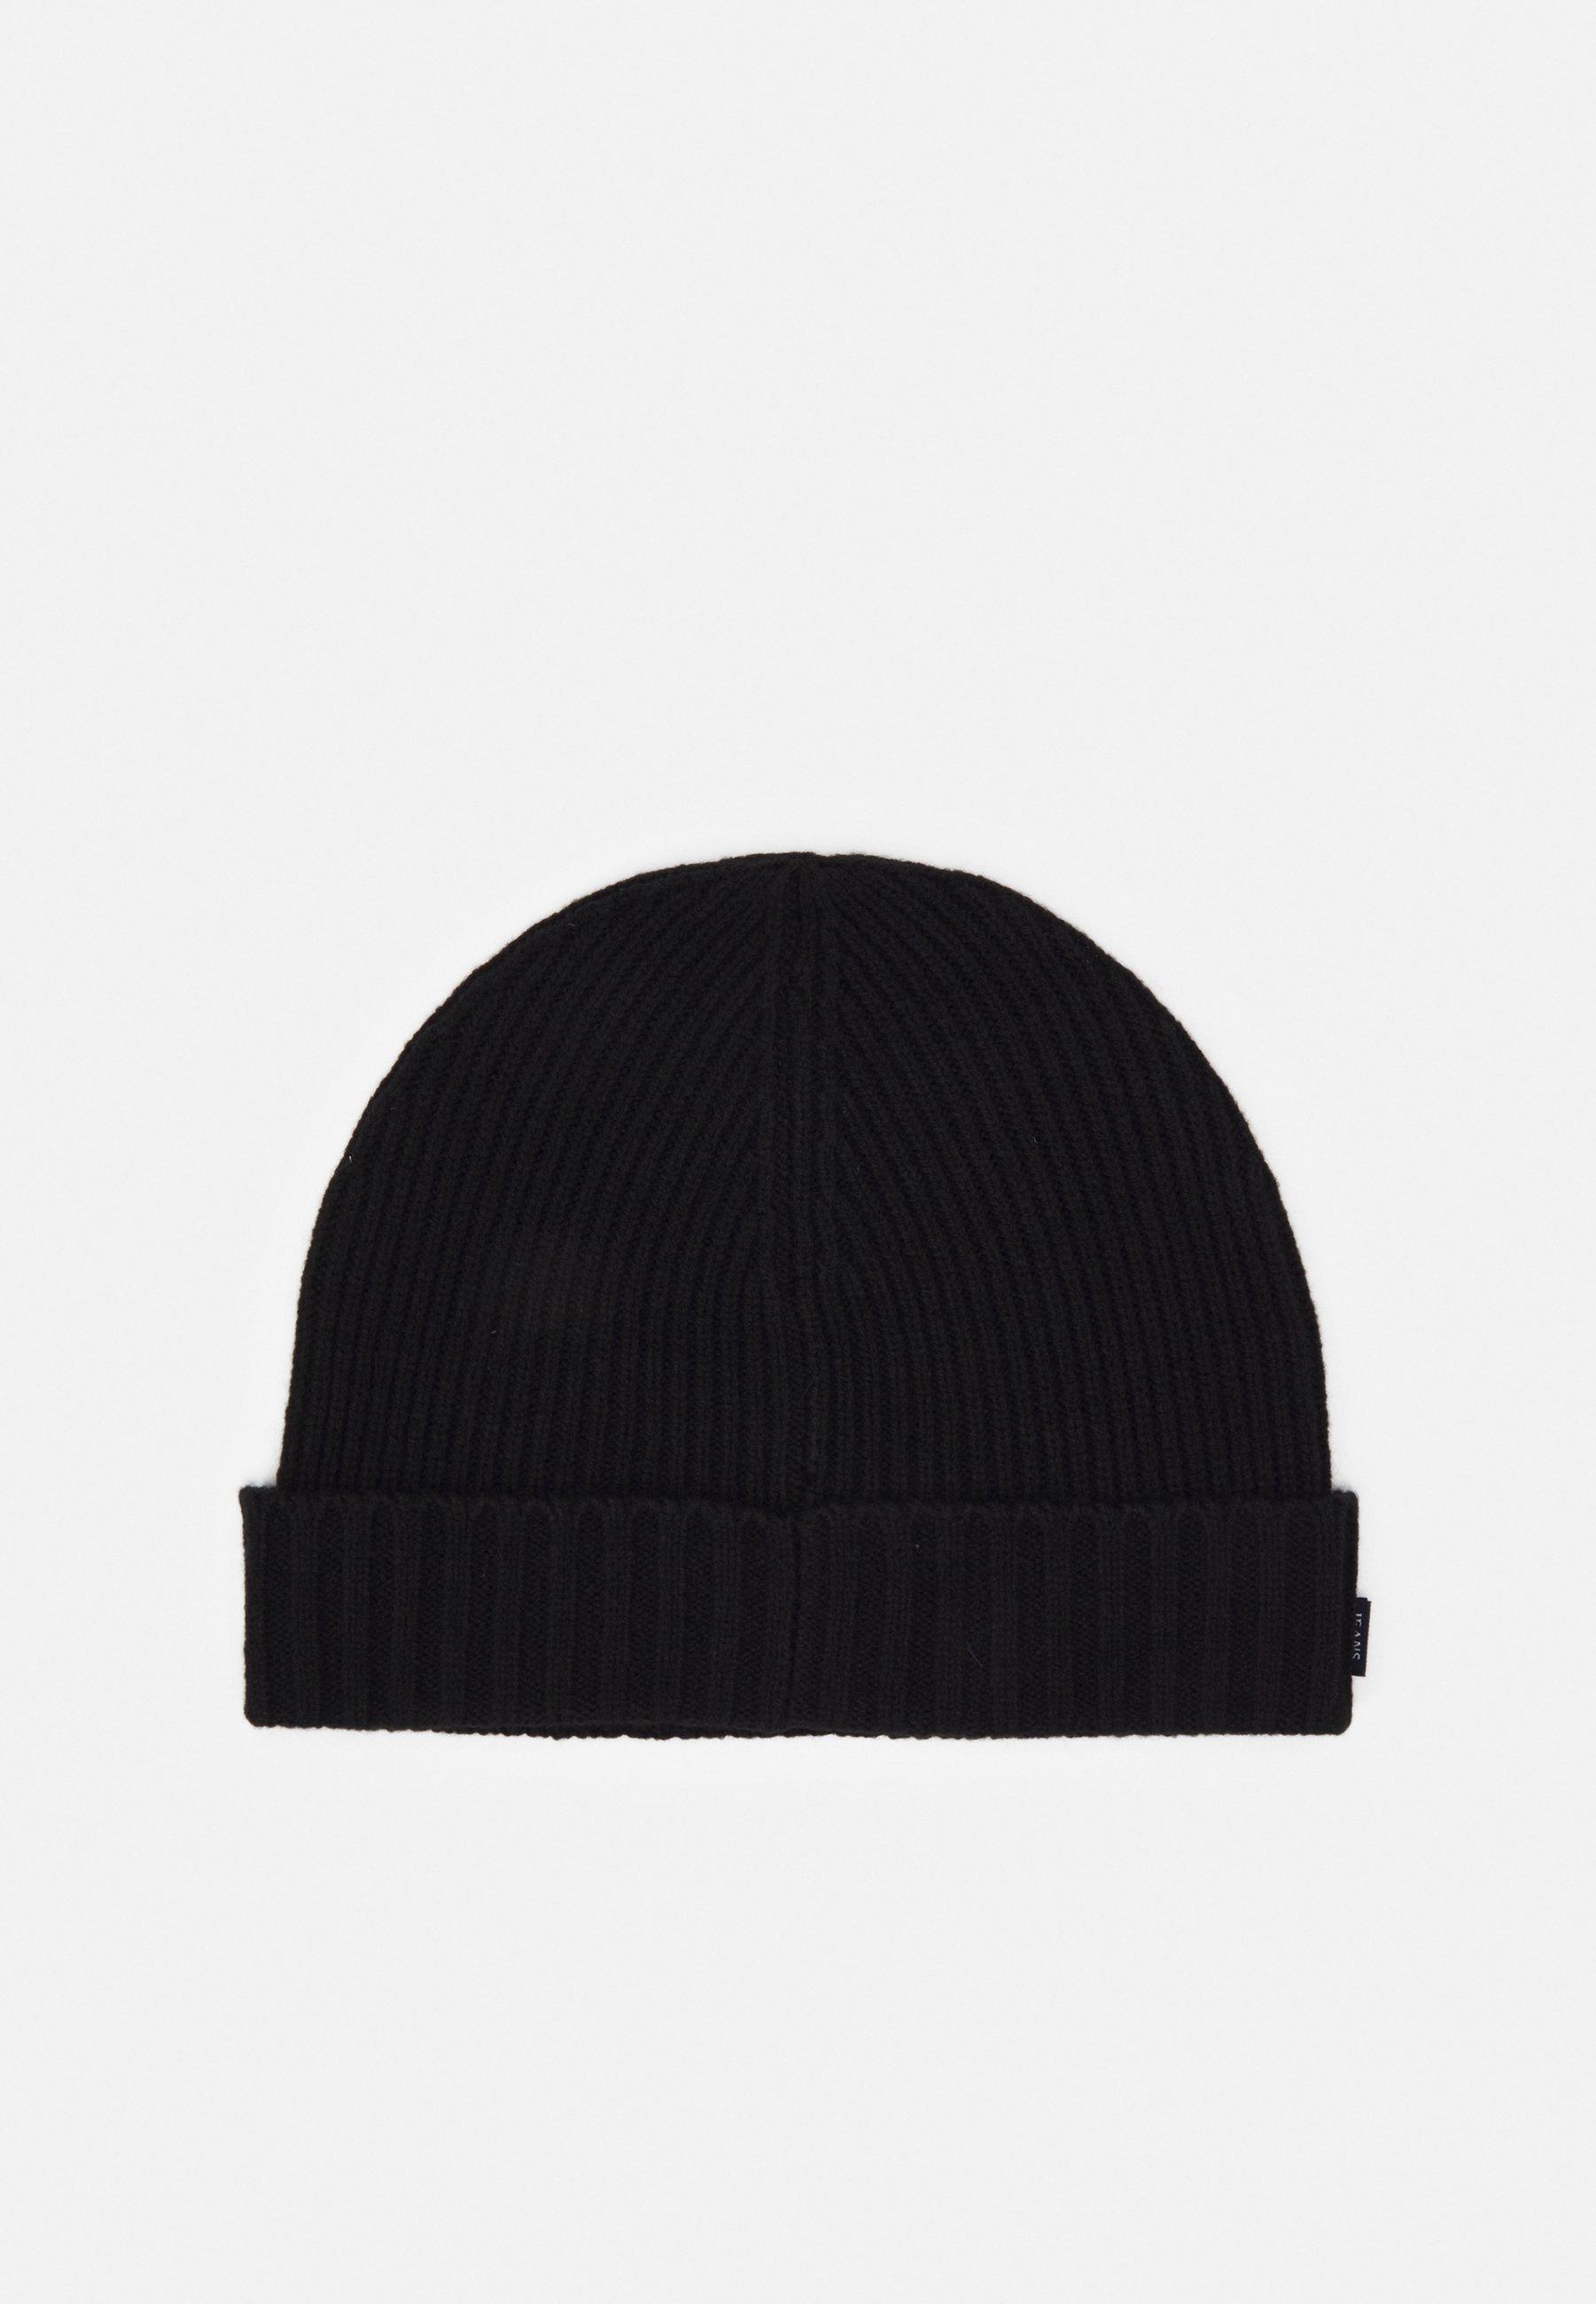 Joop! Francis - Mütze Black/schwarz